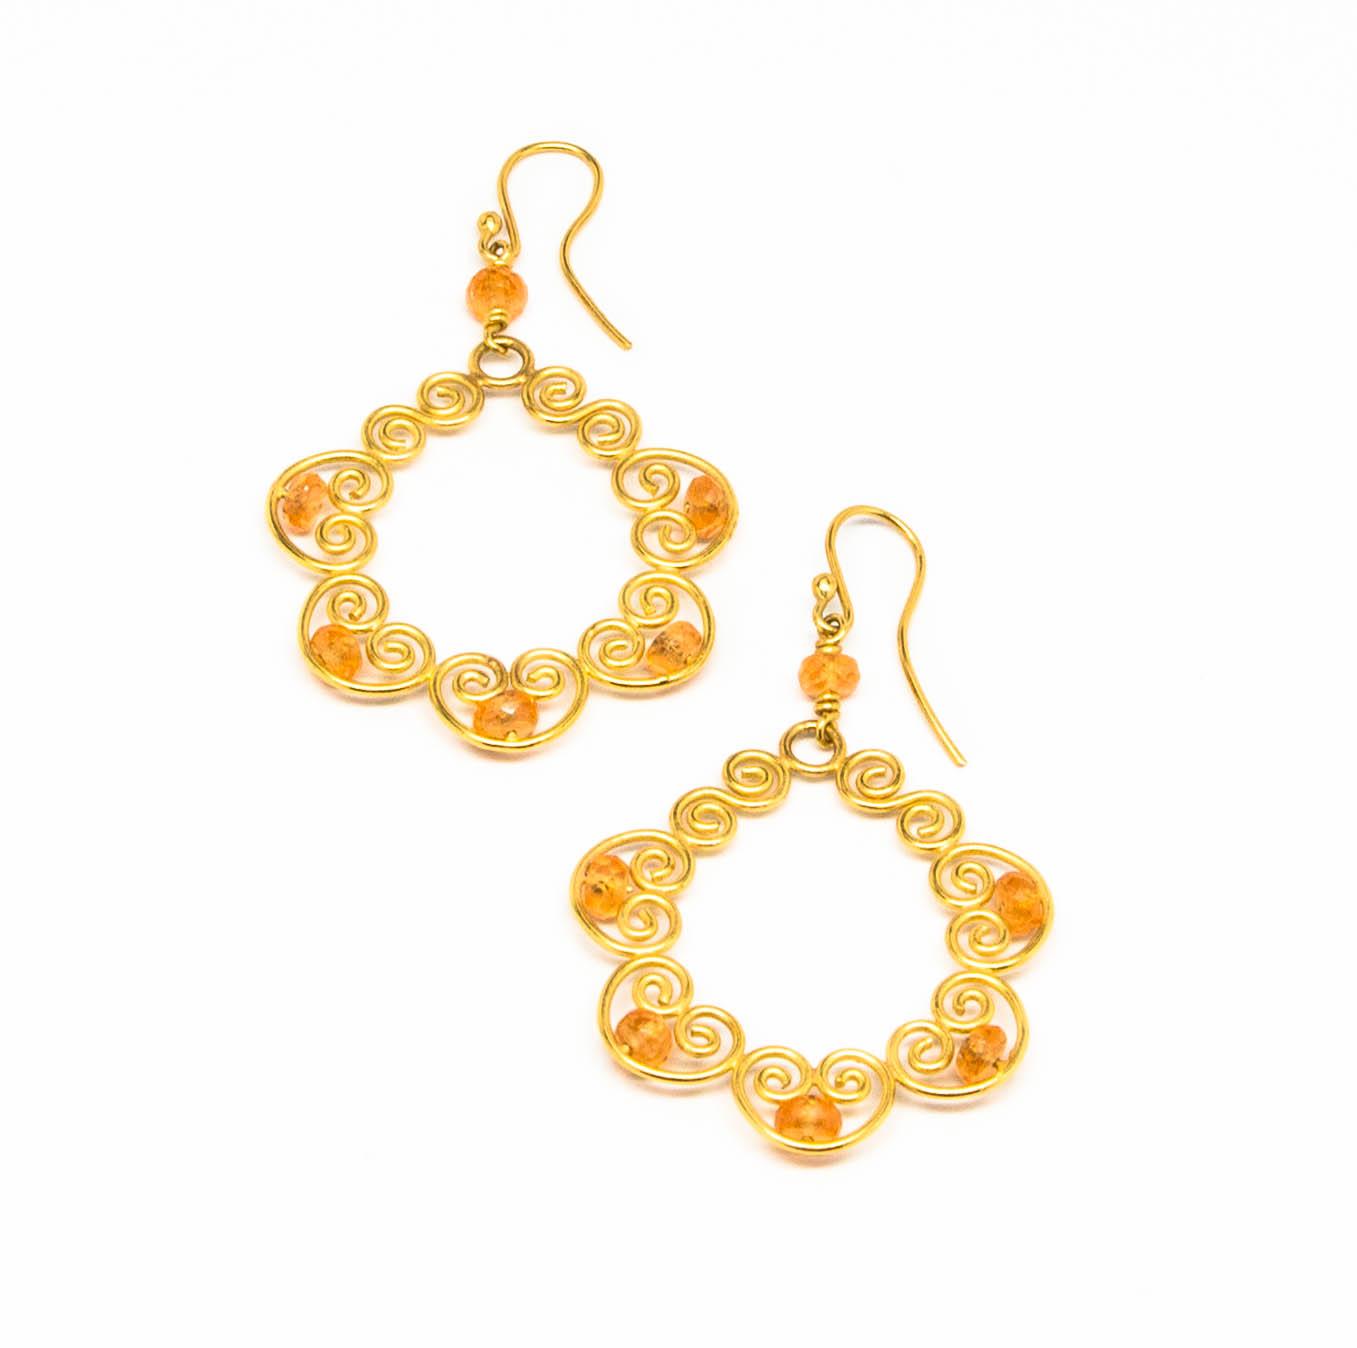 dec21 jewelry5-562.jpg